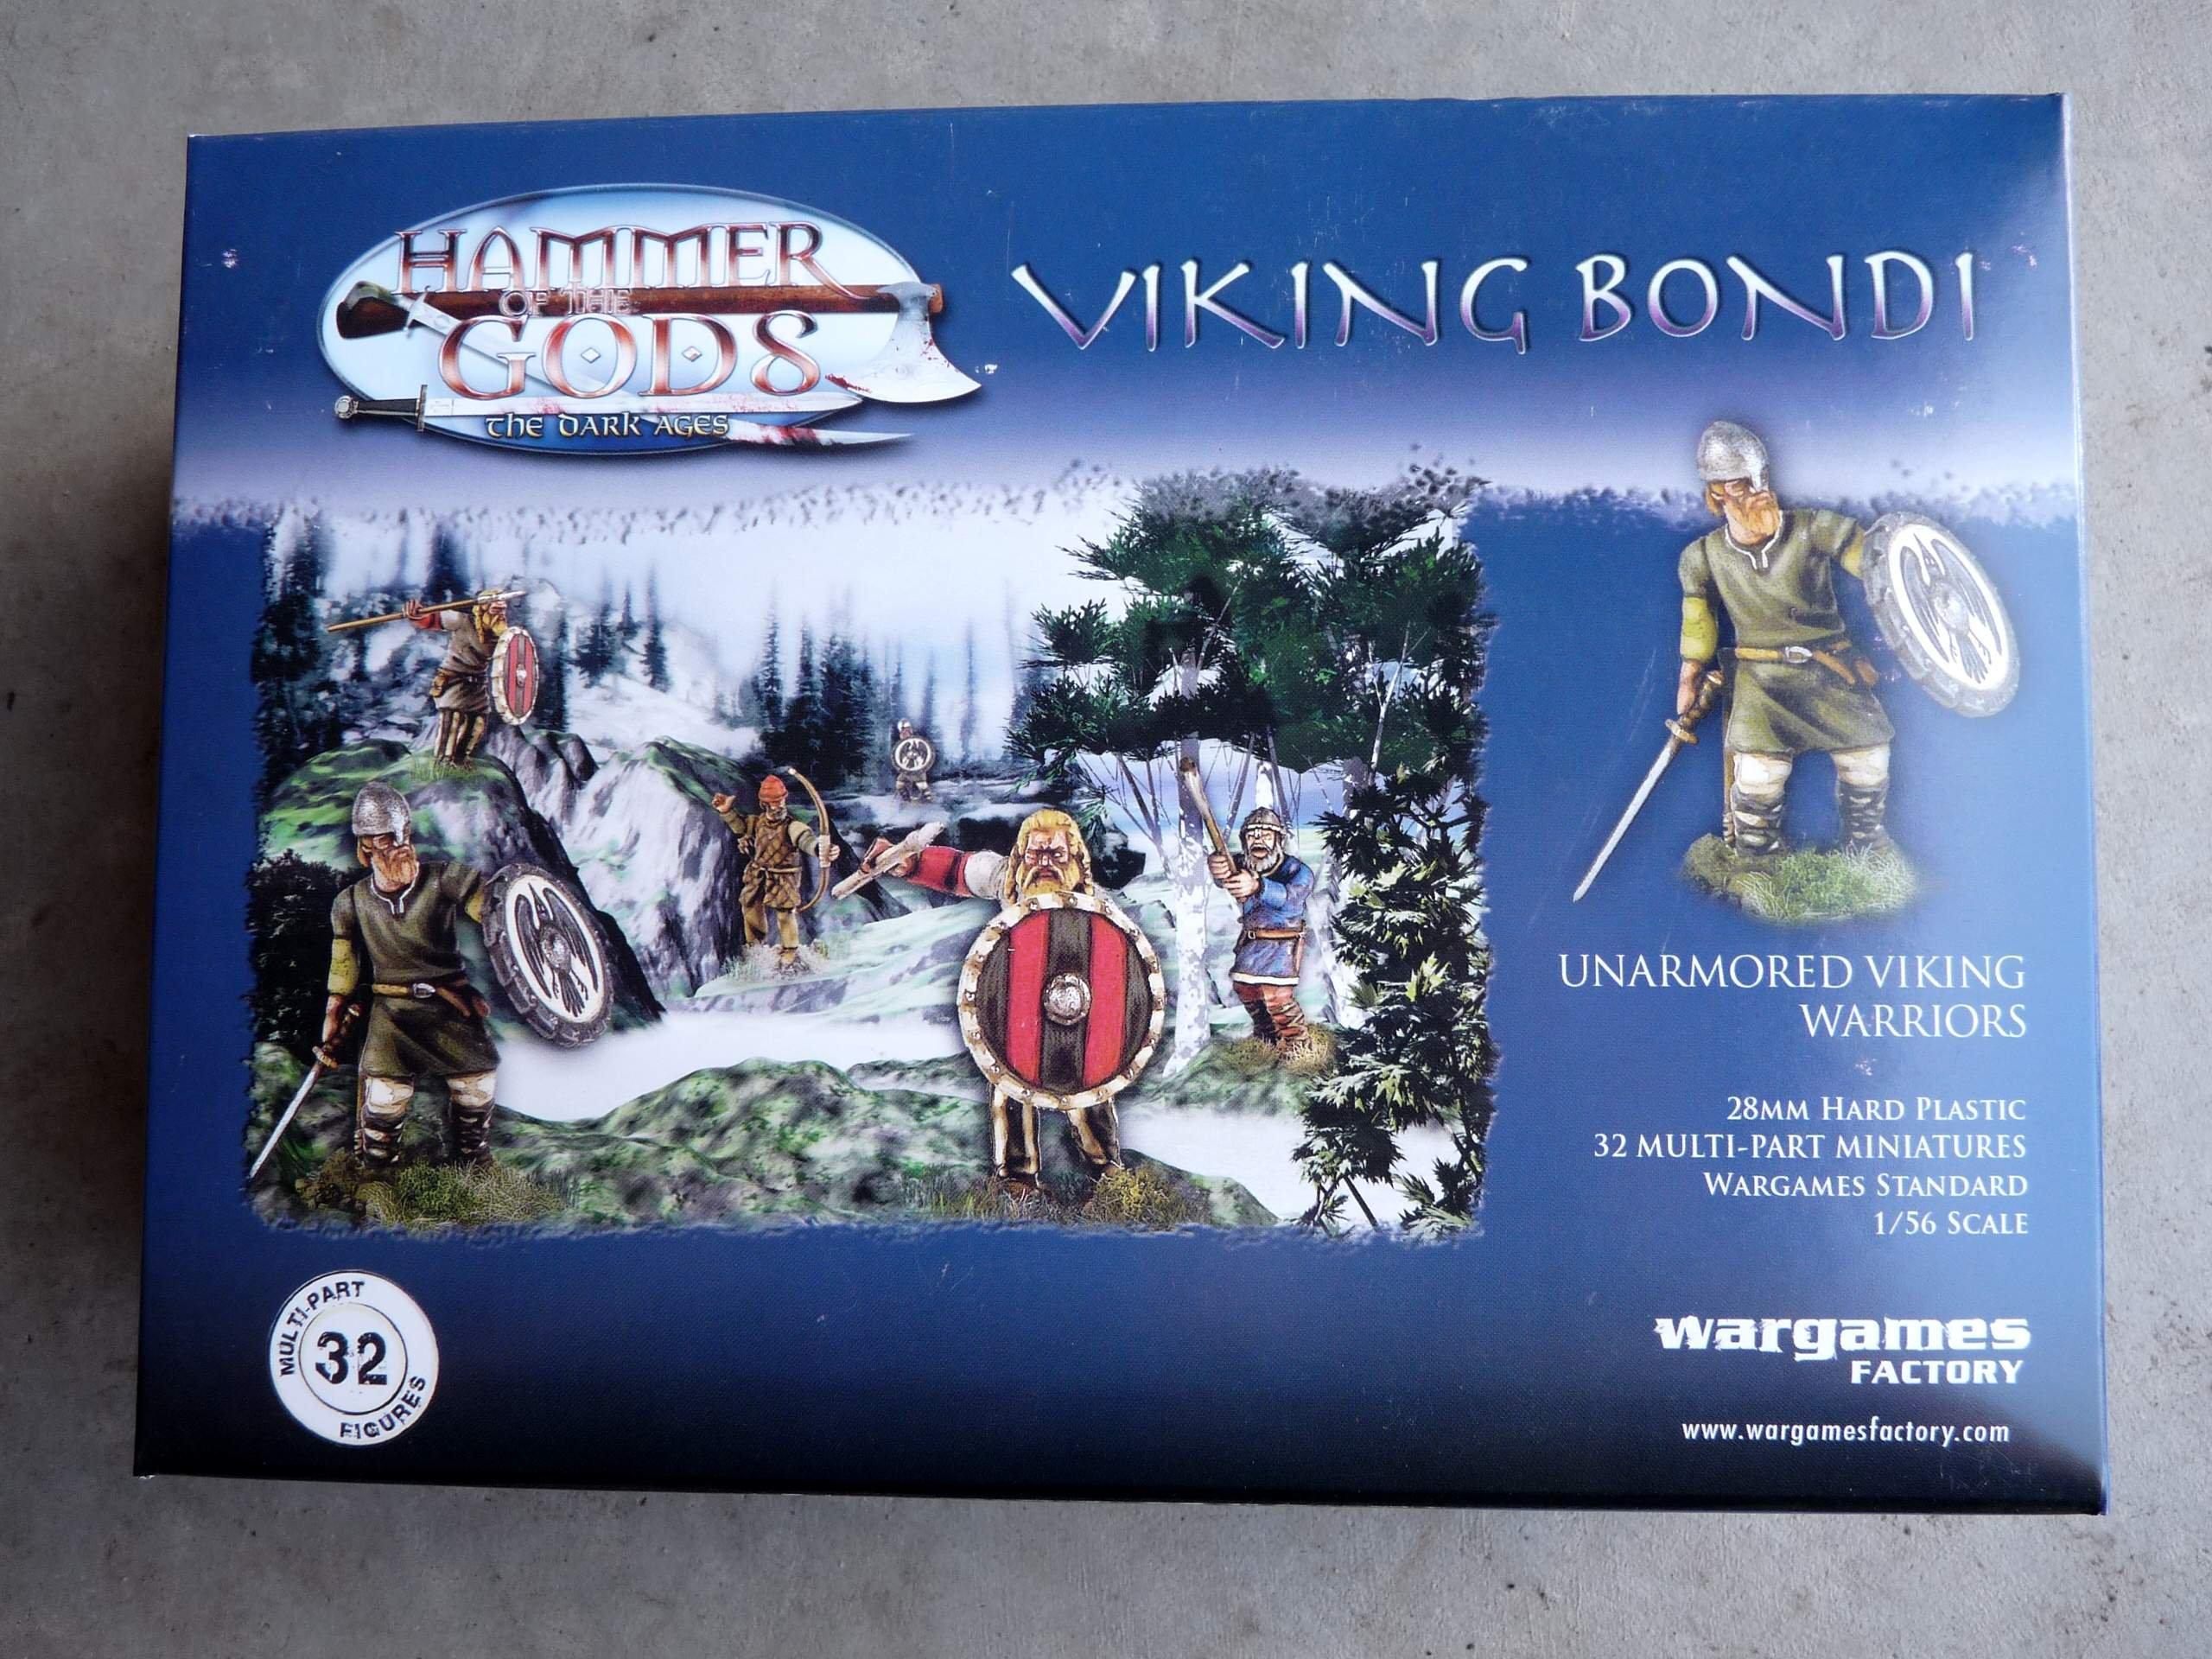 VIKING BONDI 28MM (32-UNARMOURED FIGURES): Amazon.es: Wargames Factory: Libros